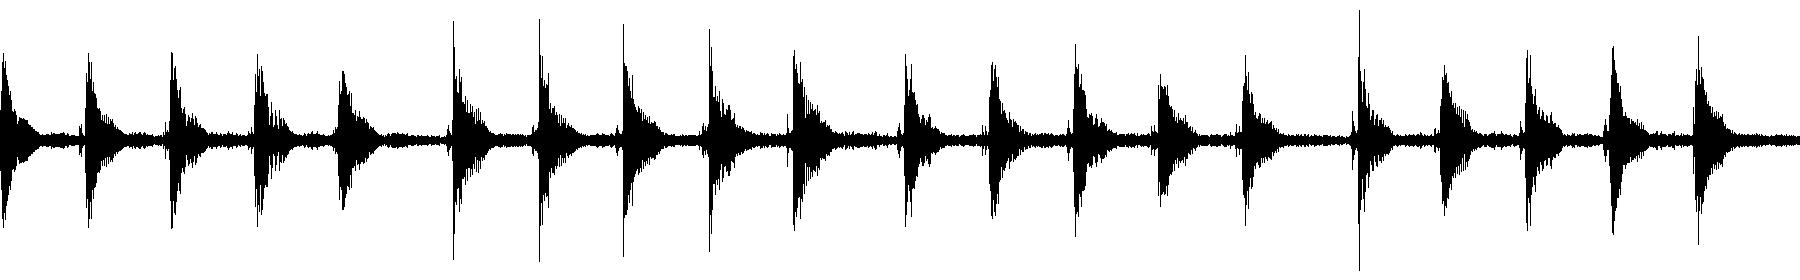 kshmr3 electric guitar chords 13   110bpm g a fm7 g